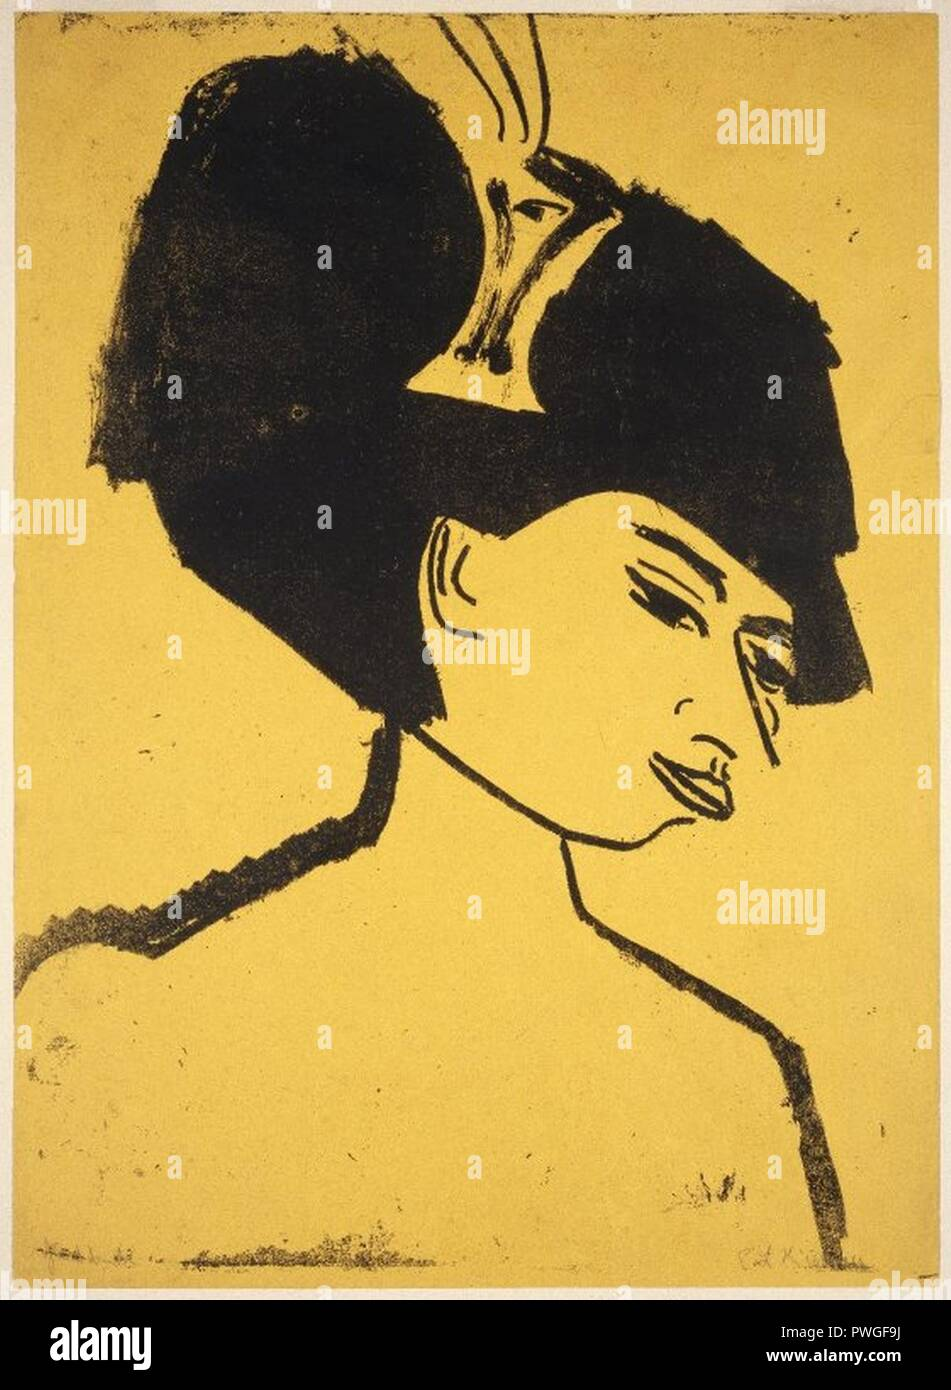 Milliner with Hat (Modistin mit Hut) - Ernst Ludwig Kirchner. - Stock Image